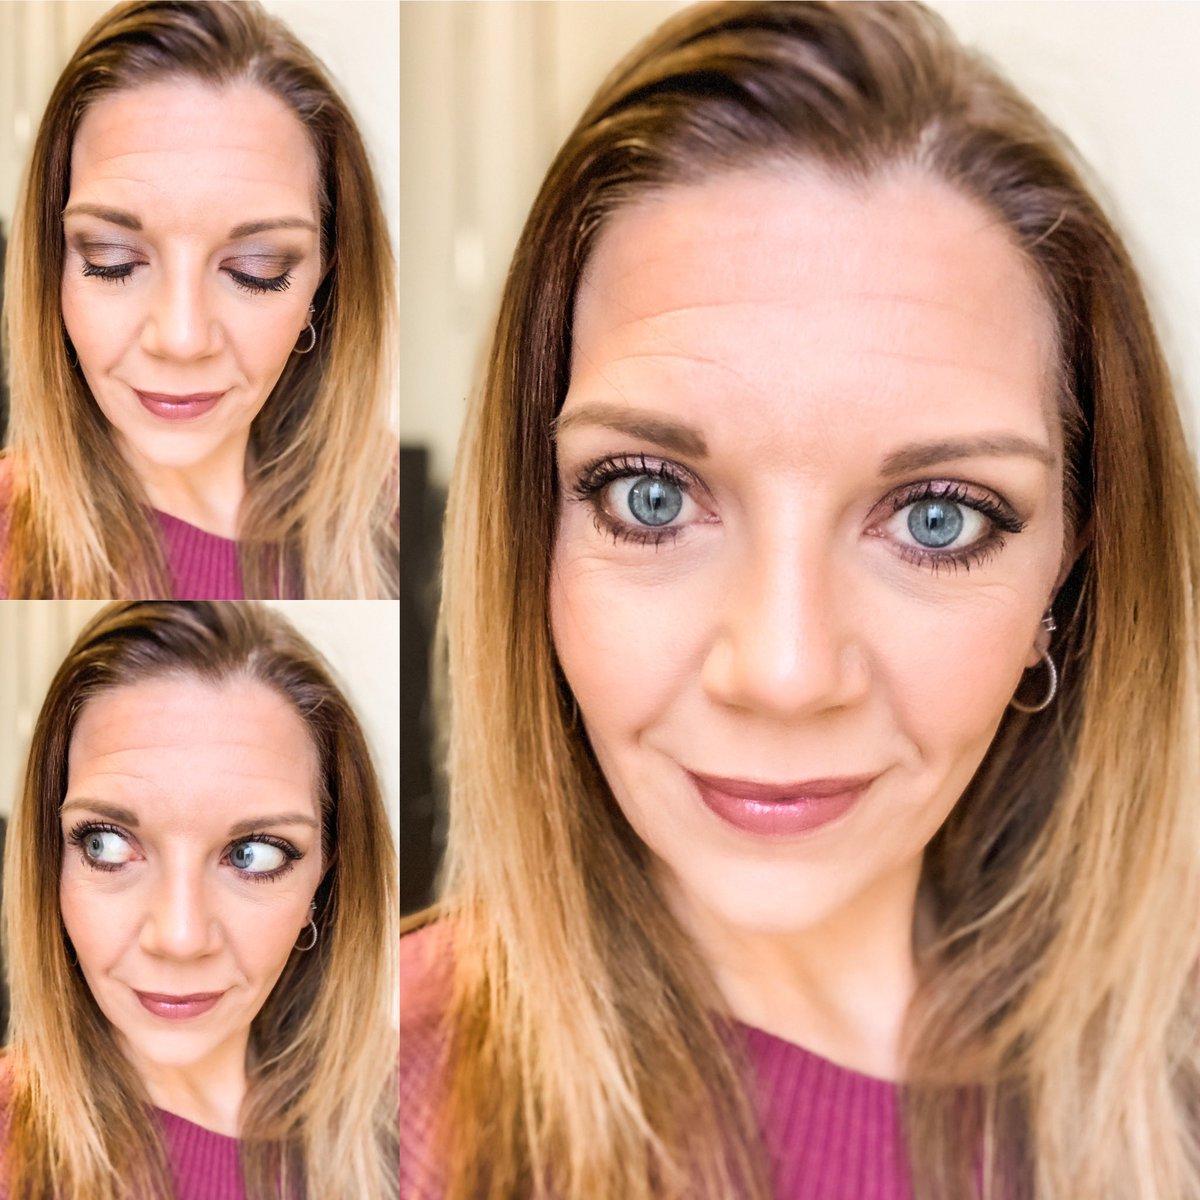 Monday cool tone vibes. #makeuplook #makeuplookoftheday #drunkelephant #farsali #fentybeauty #bitebeauty #urbandecay #natashadenona #ciatelondon #no7 #wanderbeauty #benefitcosmetics #wetnwildbeauty #maccosmetics #toofaced #charlottetilbury #tartecosmetics #essence #hourglasspic.twitter.com/m7HovxfUE8